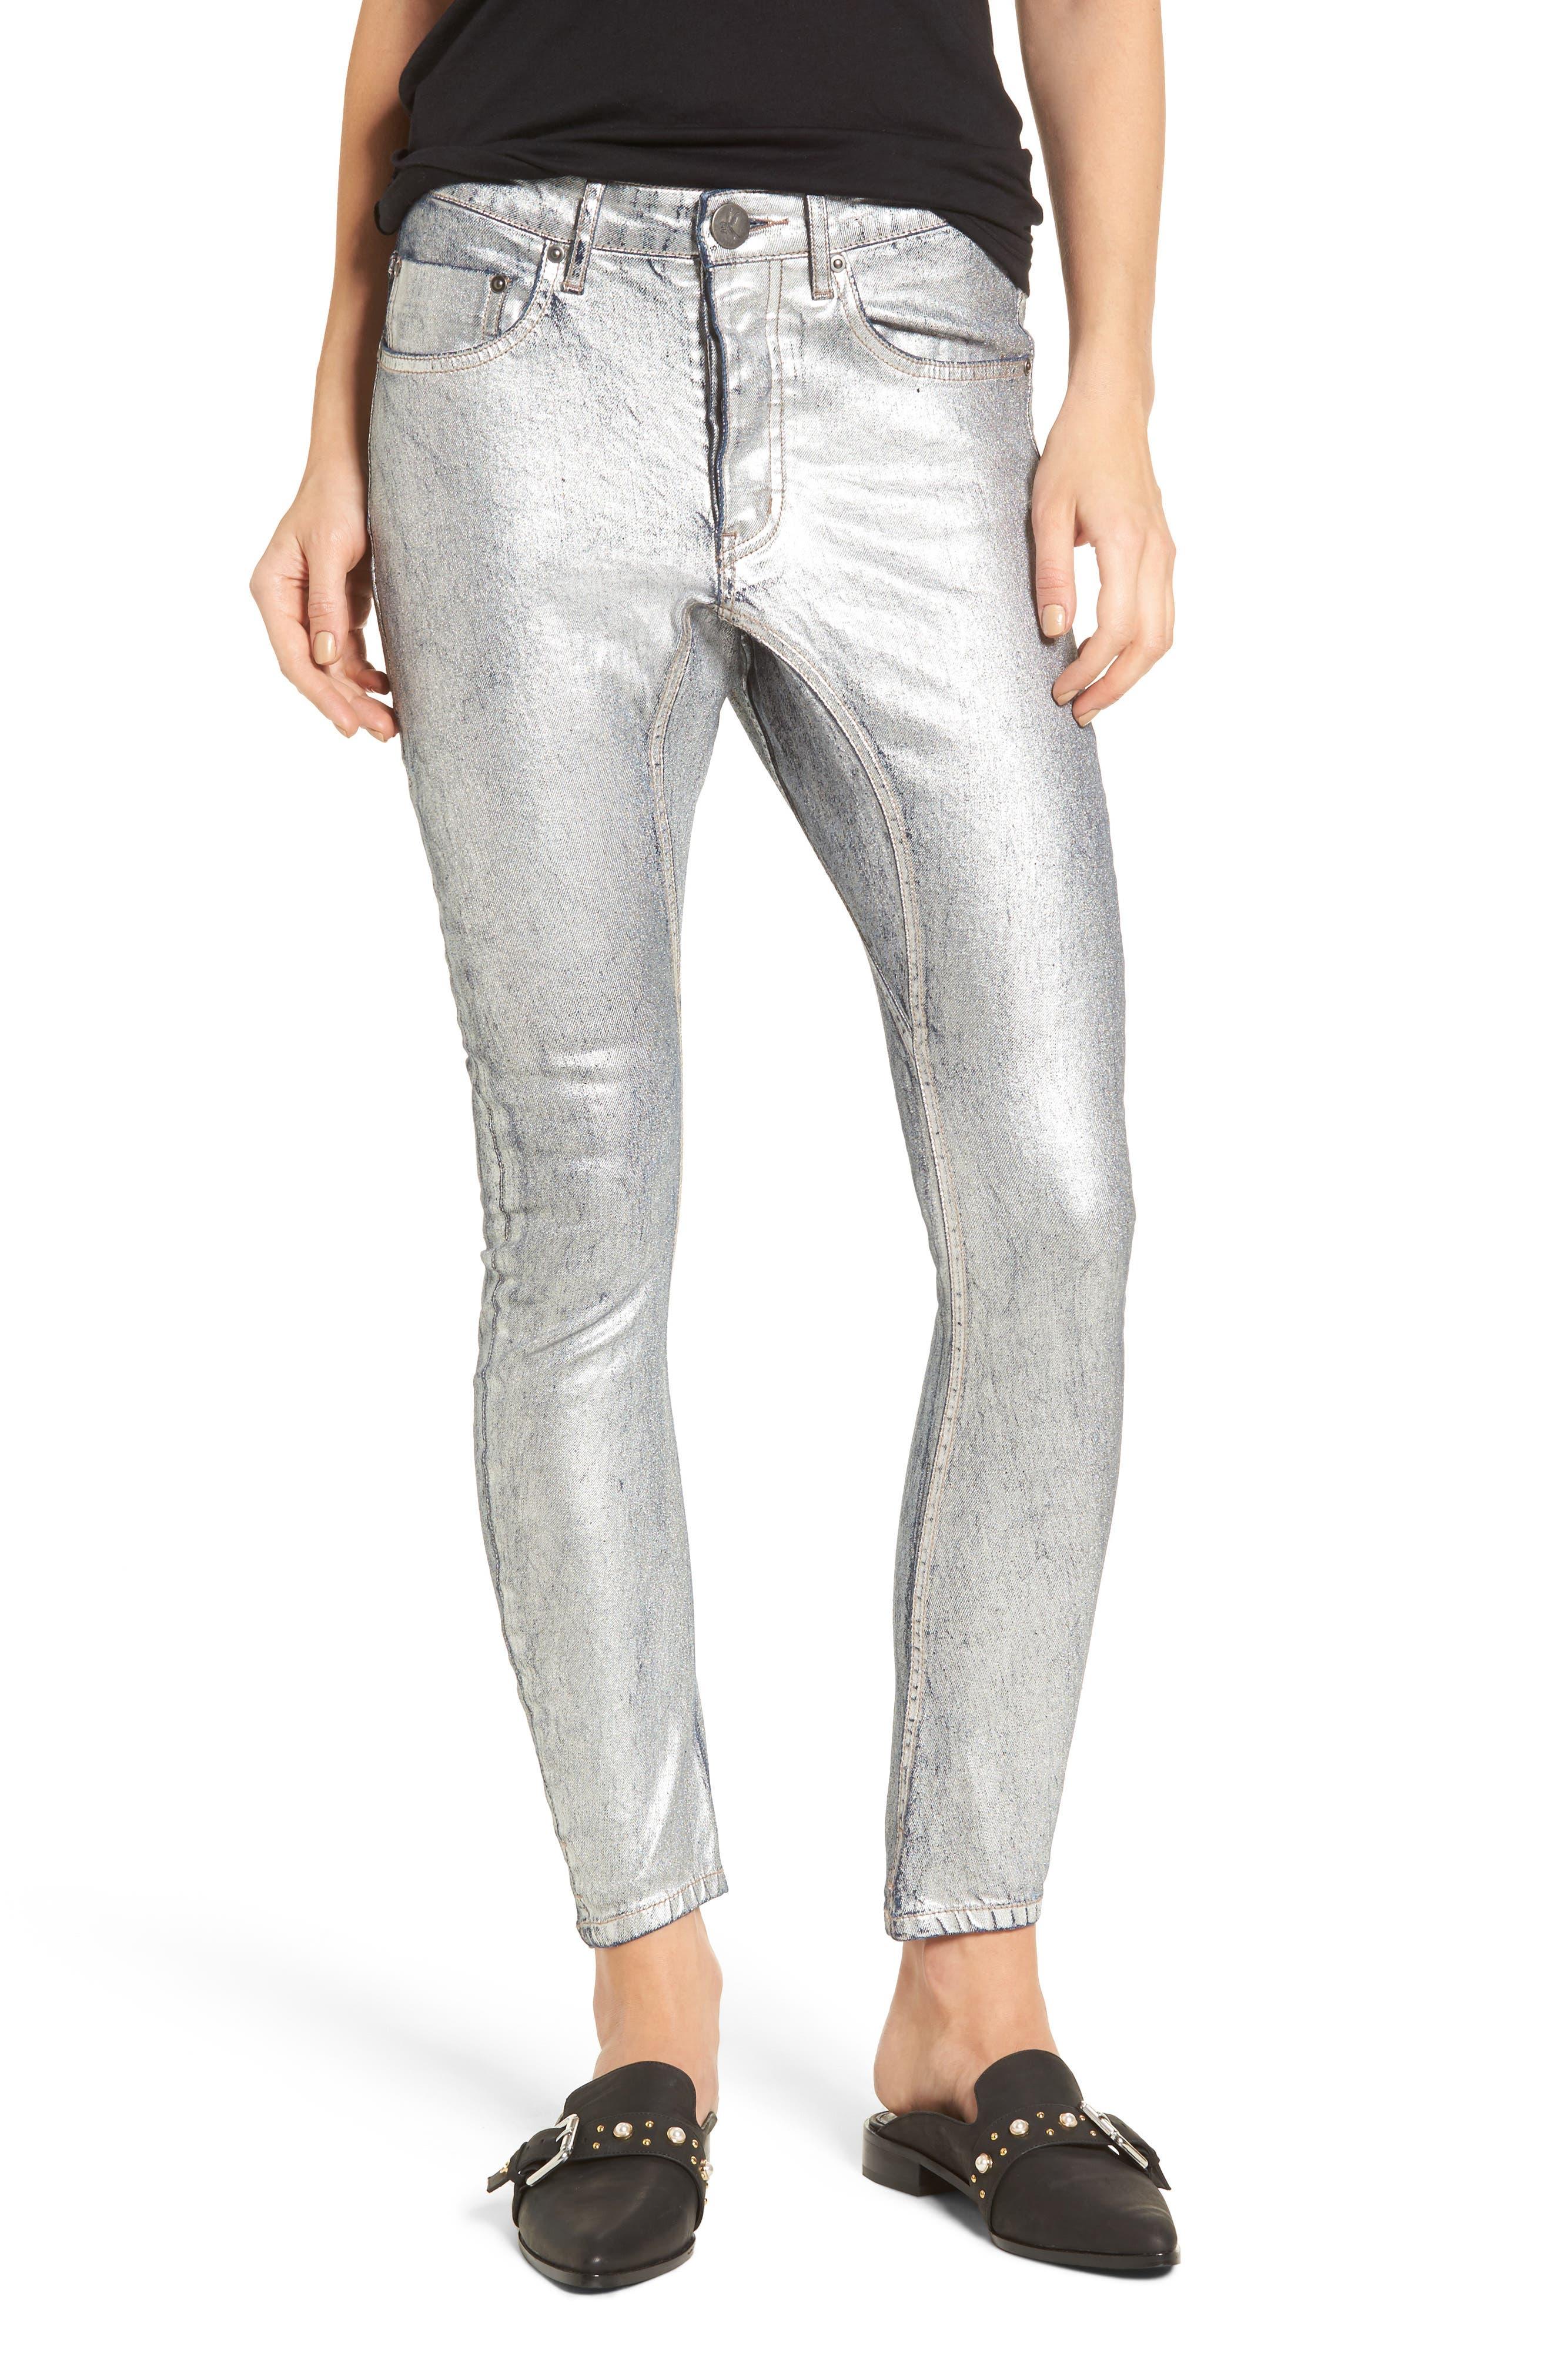 Kidds Metallic Drop Crotch Skinny Jeans,                             Main thumbnail 1, color,                             Nightshade